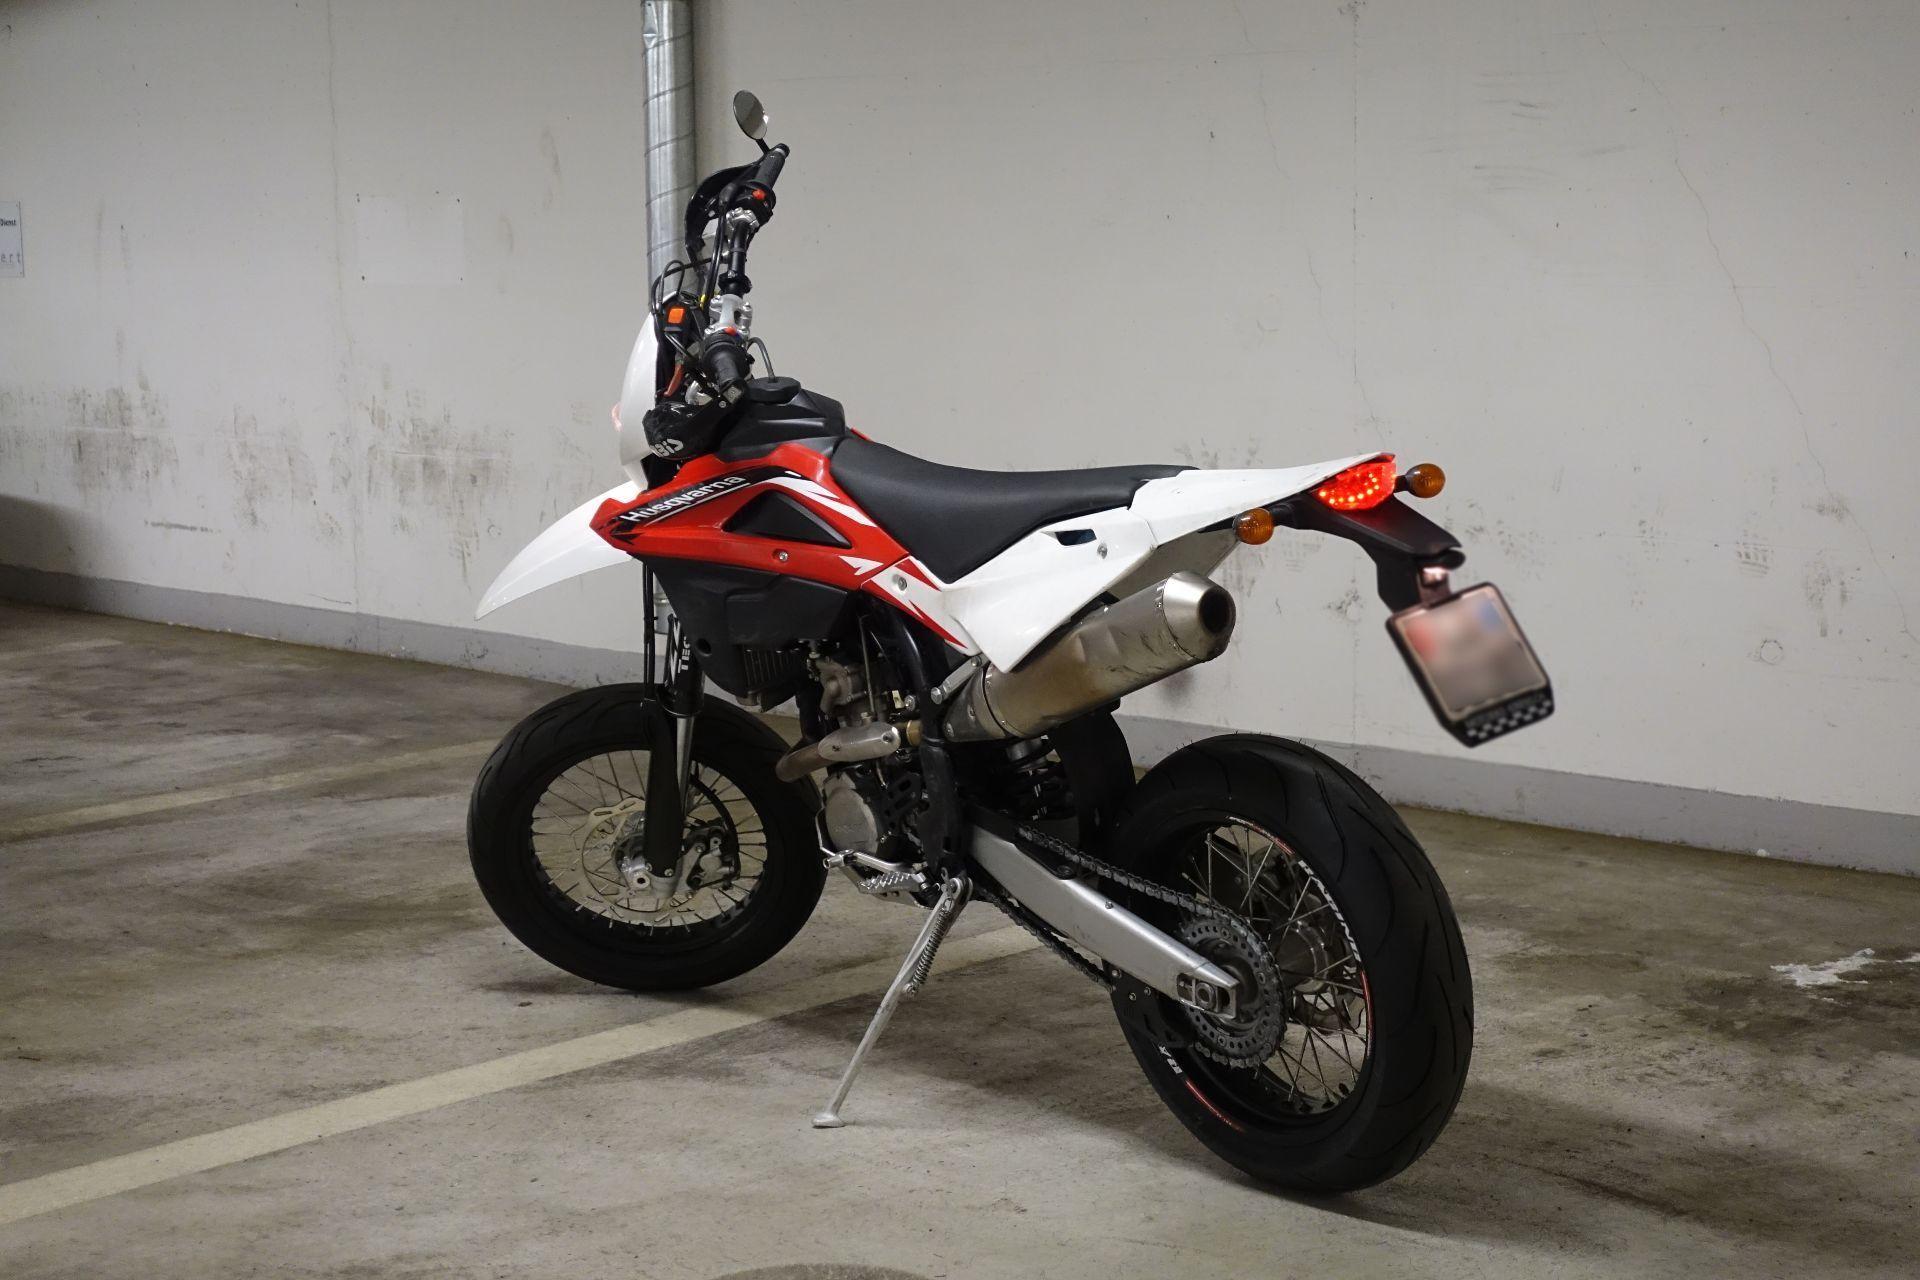 moto occasioni acquistare husqvarna 310 te motobike kriens kriens. Black Bedroom Furniture Sets. Home Design Ideas